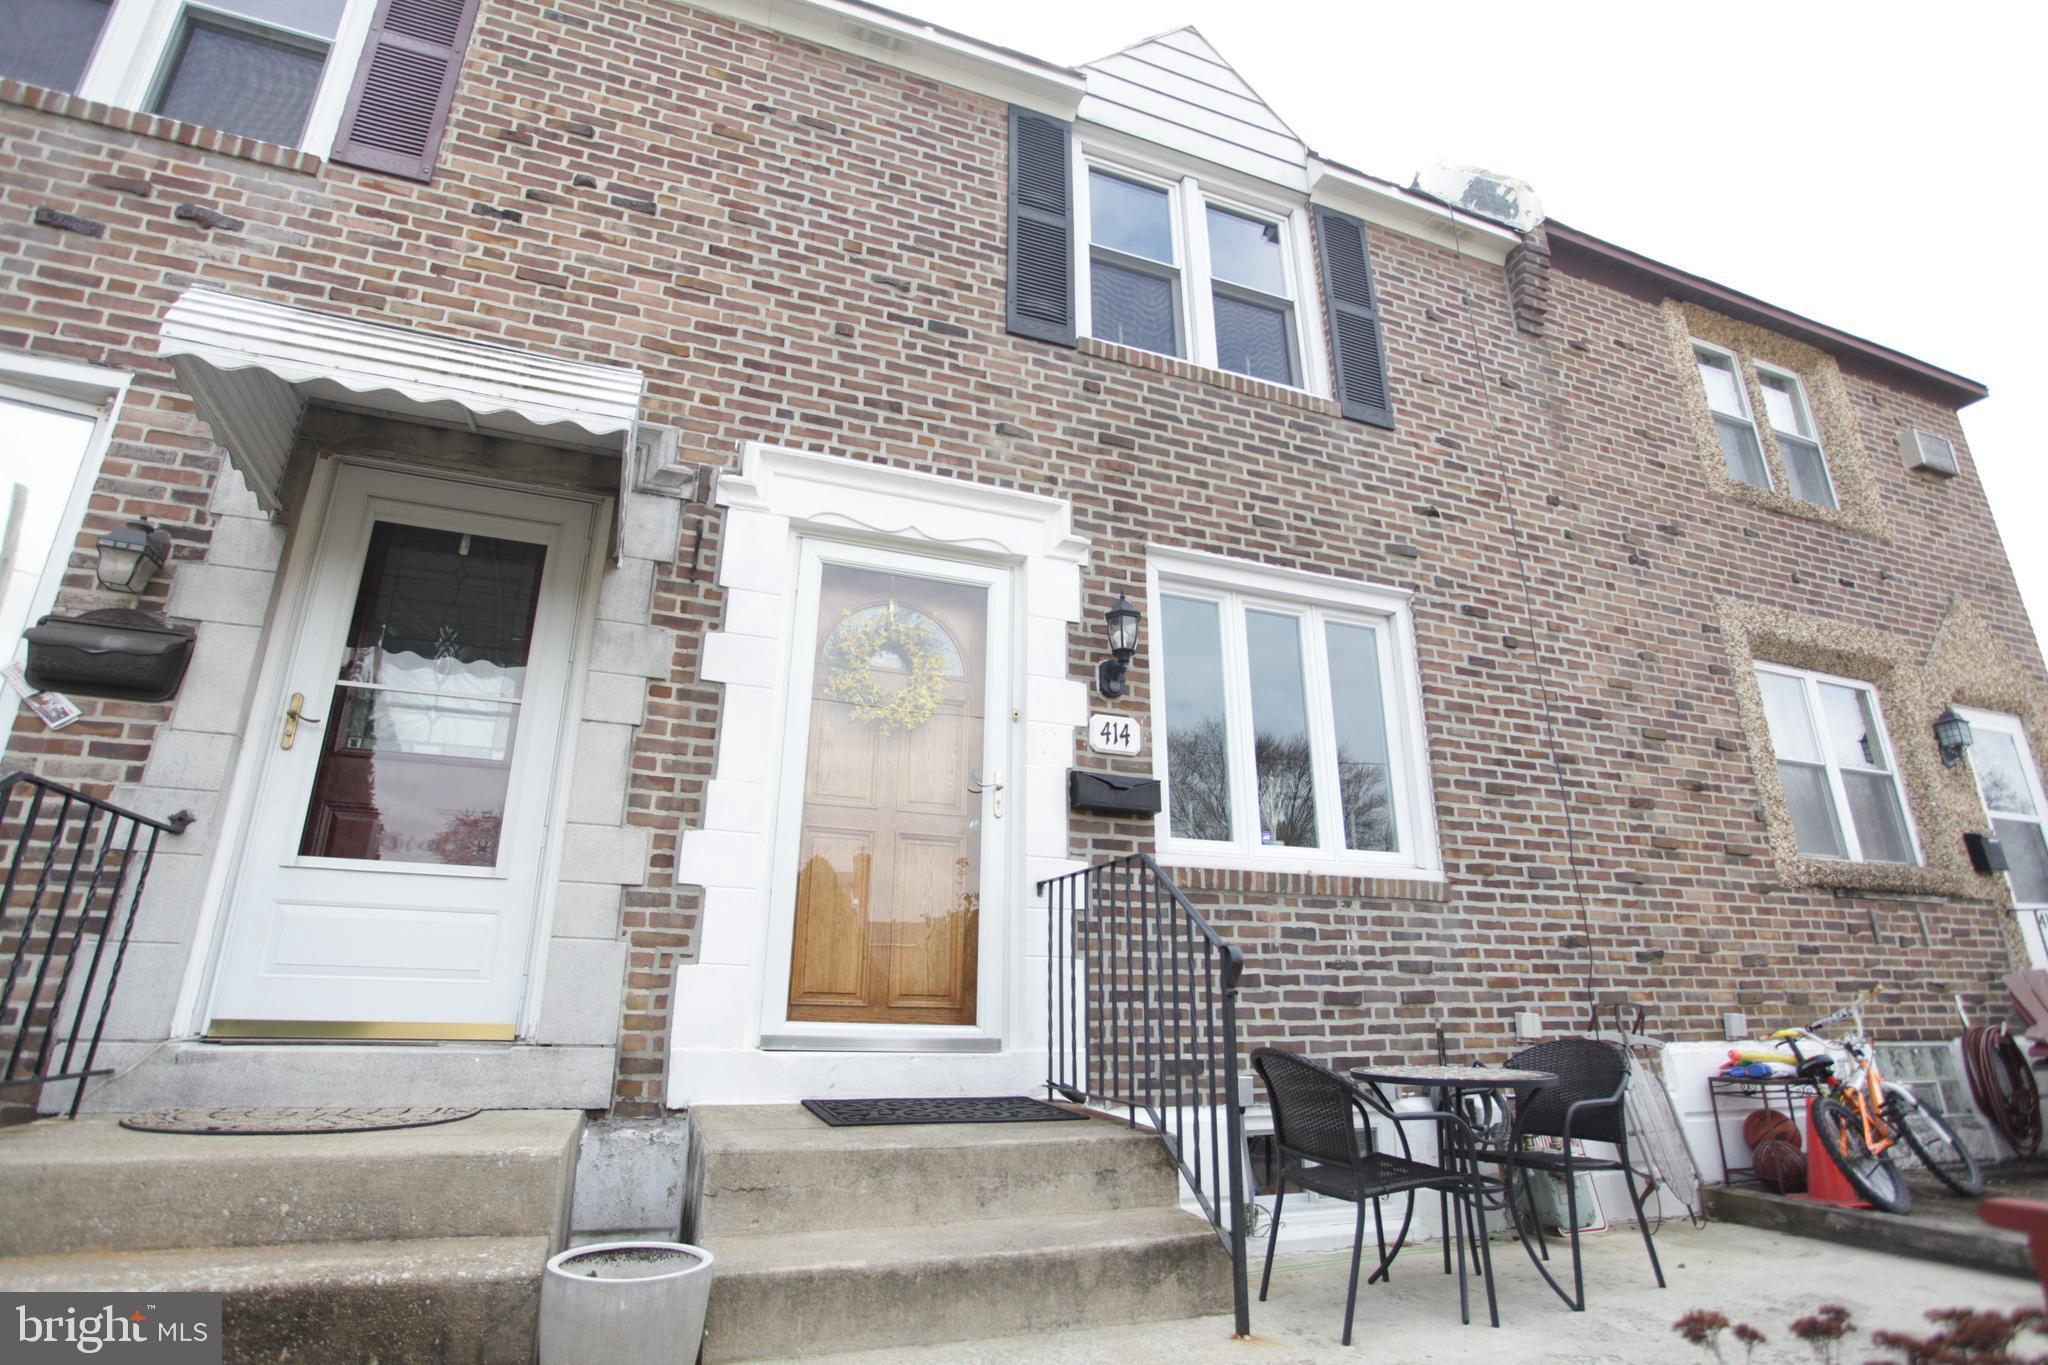 414 Rively Avenue, Collingdale, PA 19023